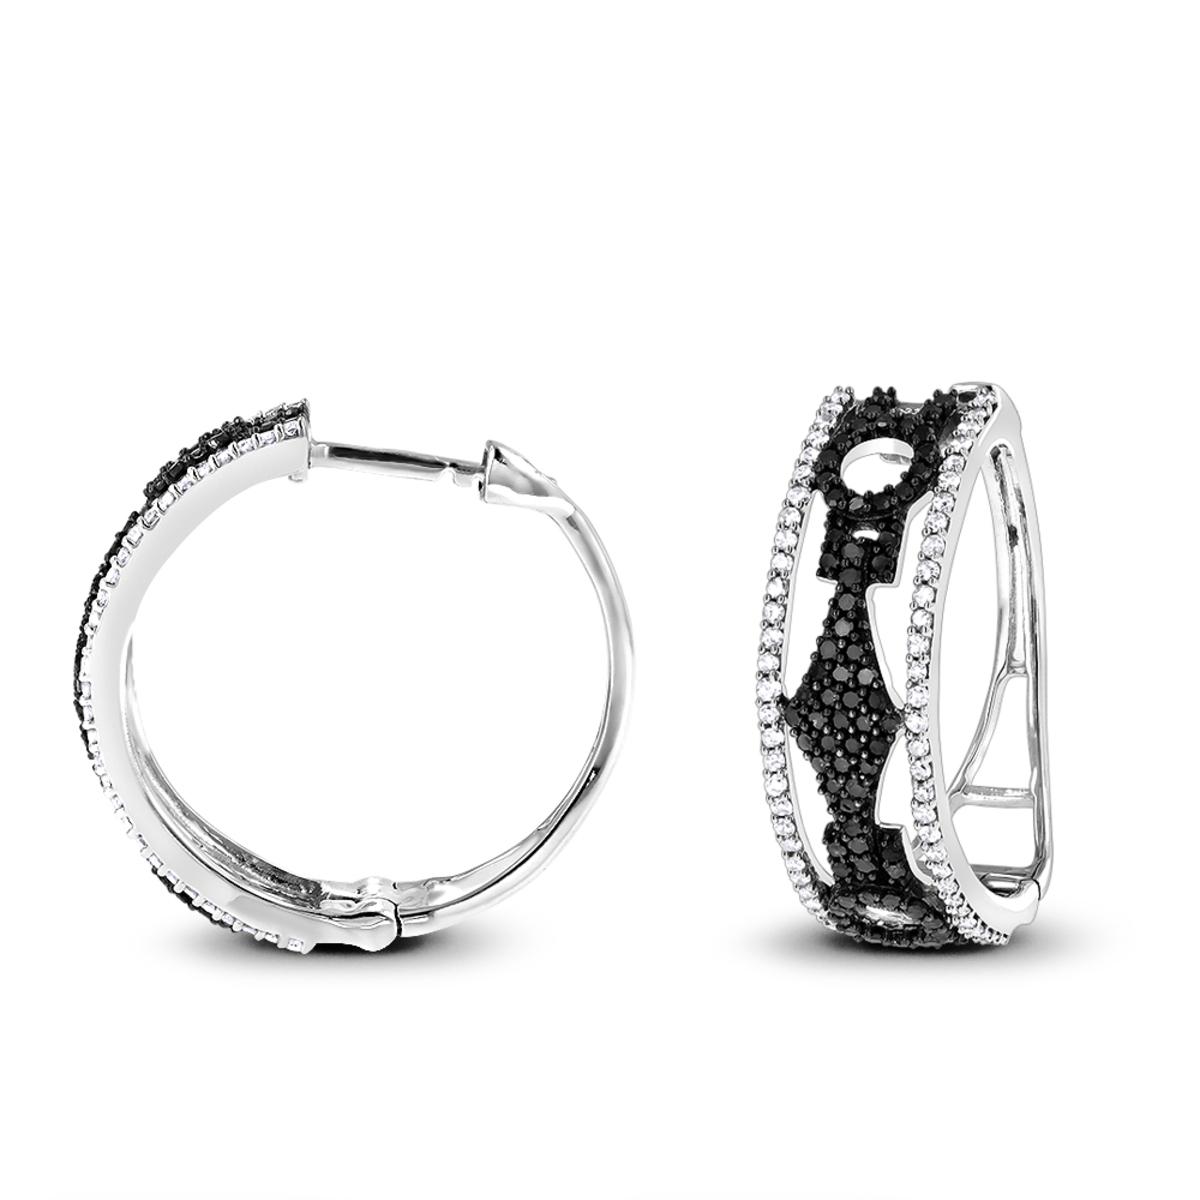 White and Black Diamond Hoop Earrings 0.9 ct 14K Gold